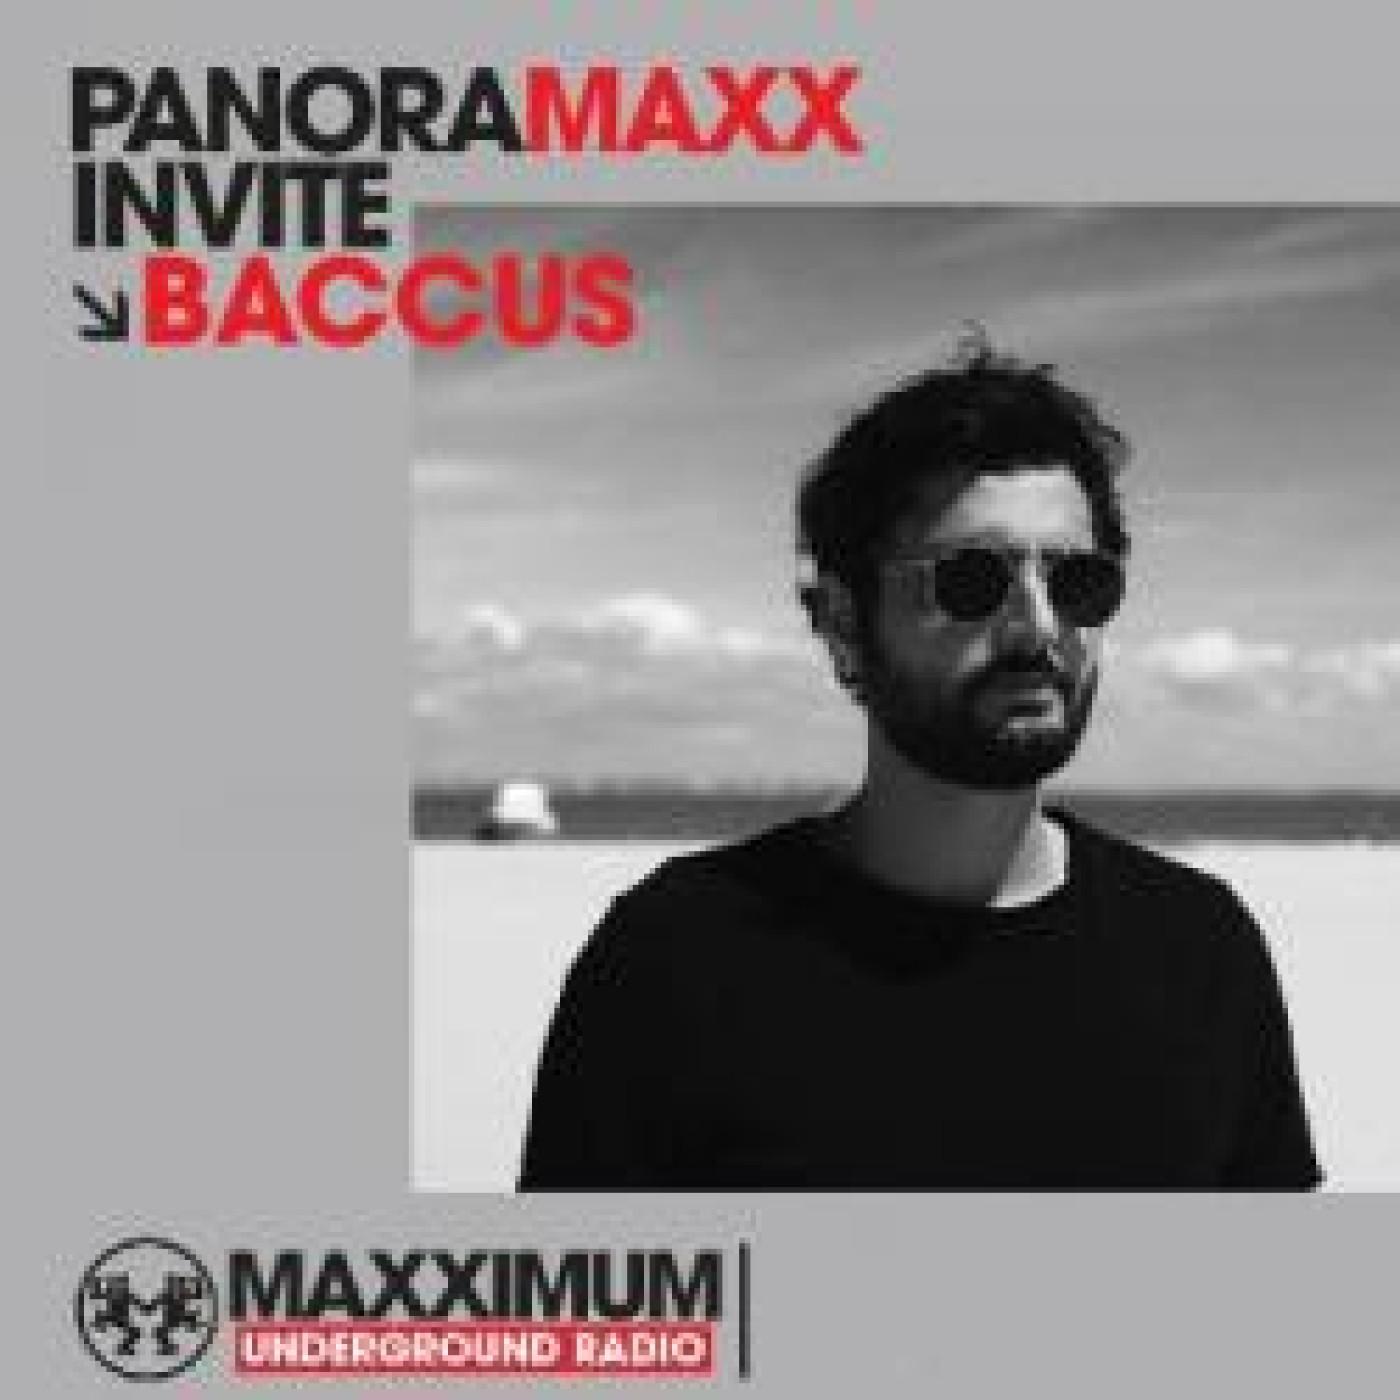 PANORAMAXX : BACCUS